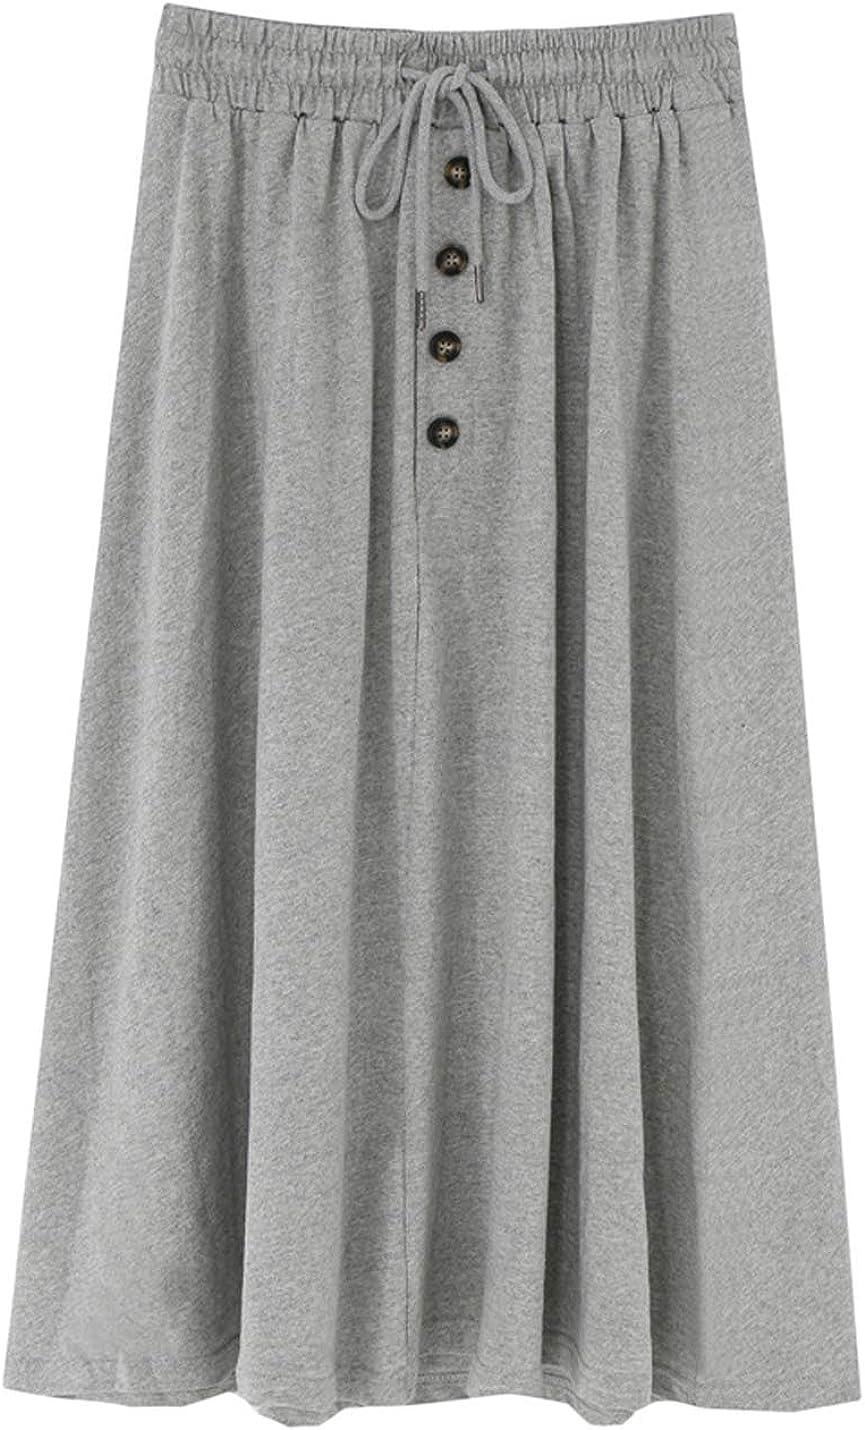 ZGZZ7 Women's Casual Cute Midi Skirts Below Knee Length A-line Ruffled Skirts